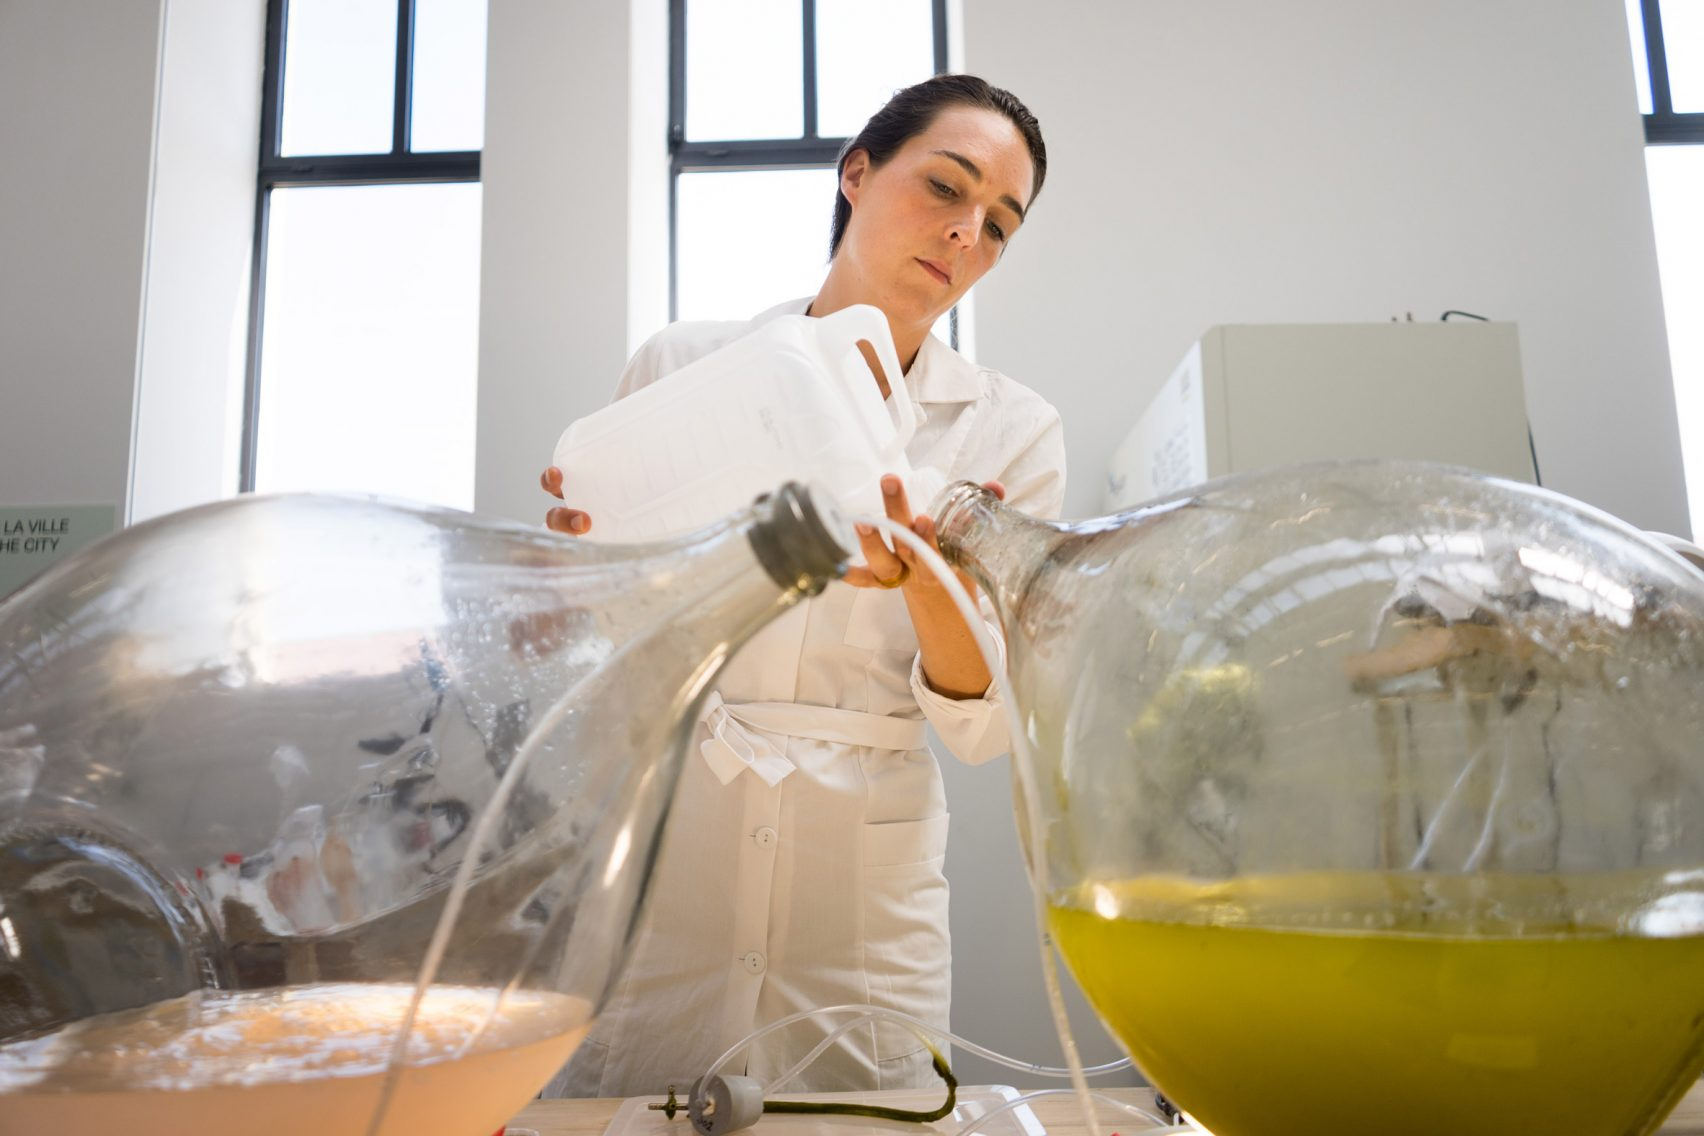 Dutch Designers Transform Algae Into 3D Printable Biopolymer Material | All3DP